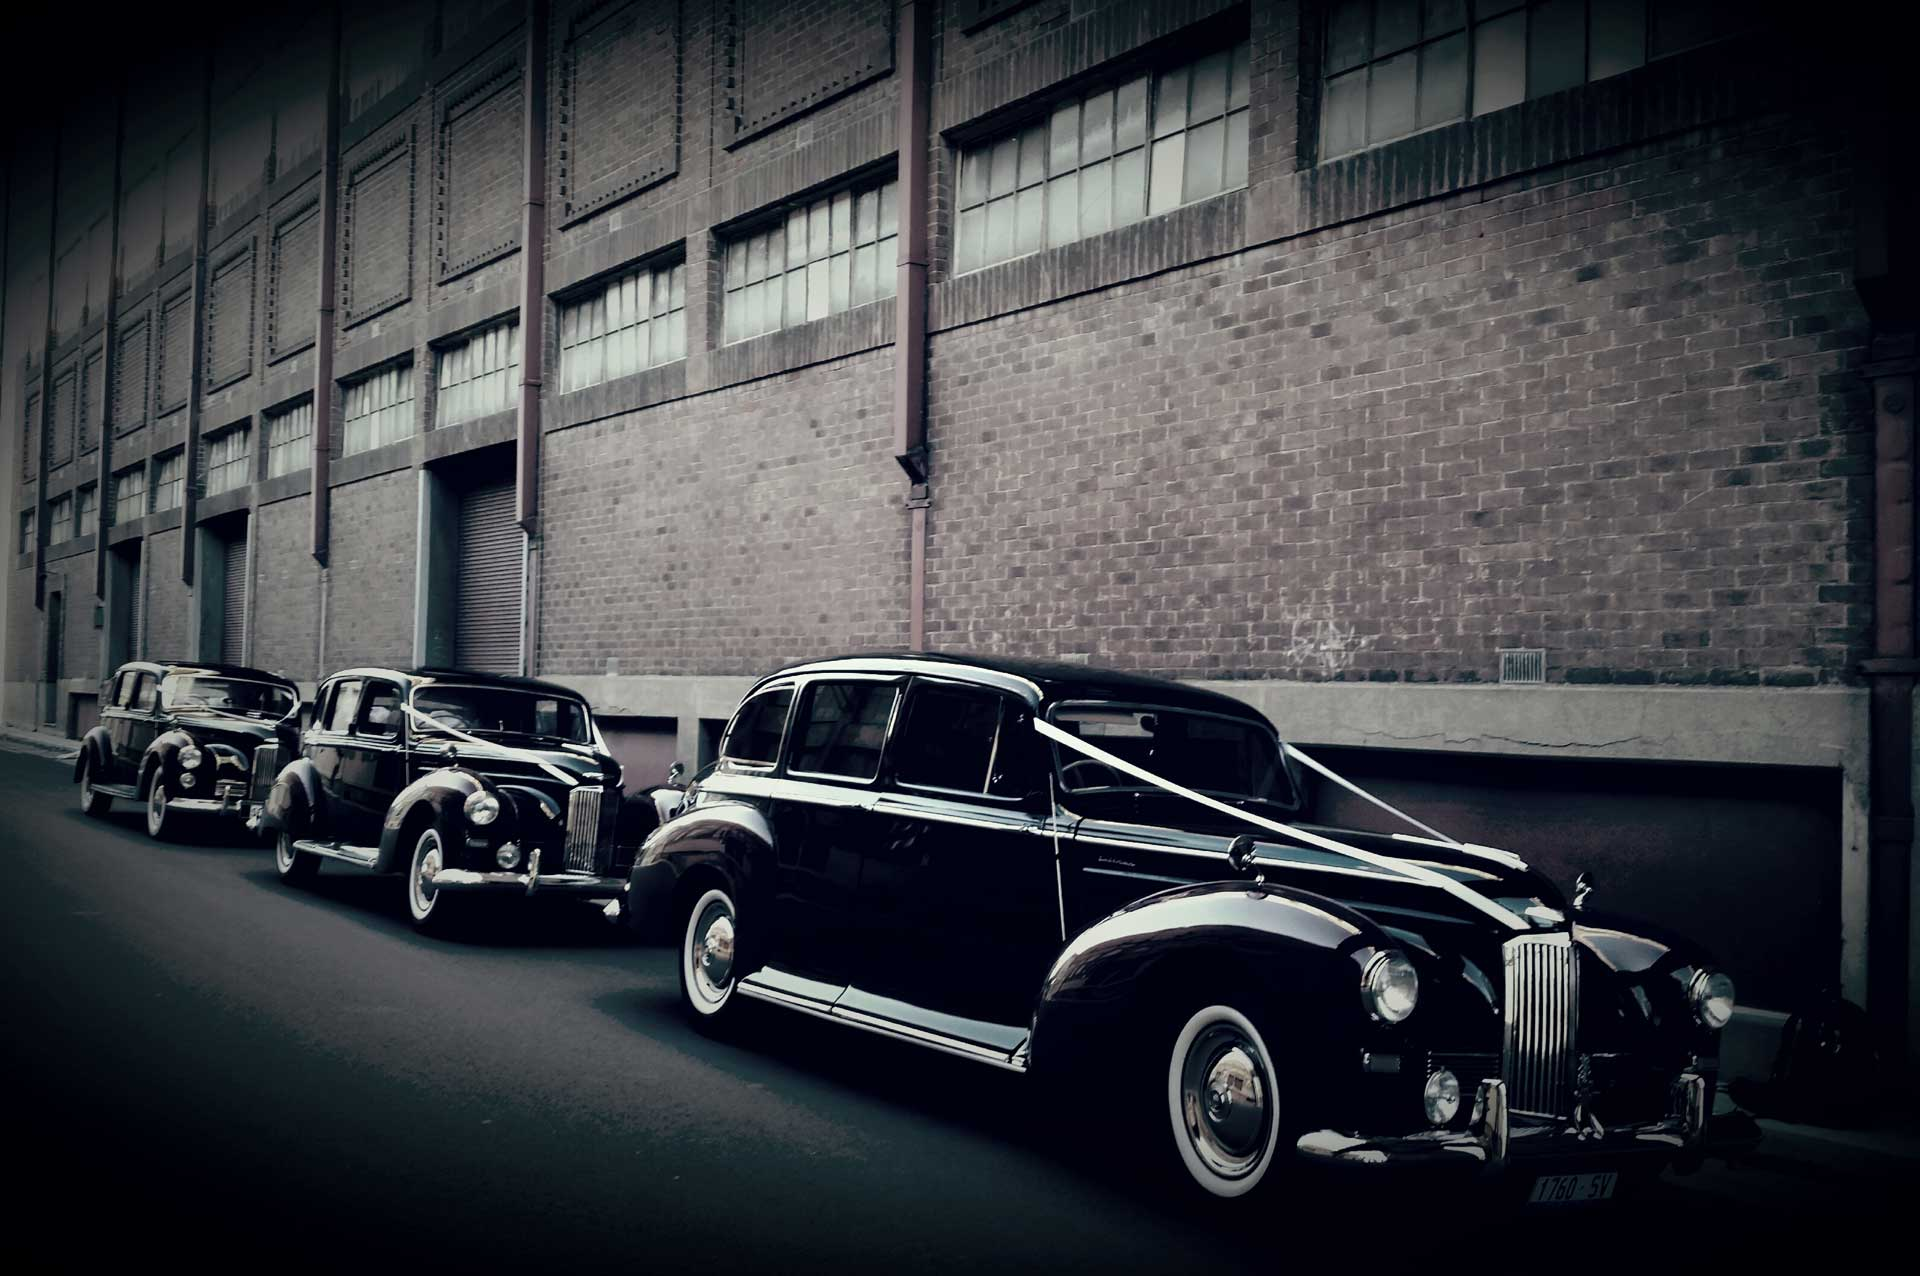 Adelaide Wedding Cars | Macphersons Chauffeured Cars